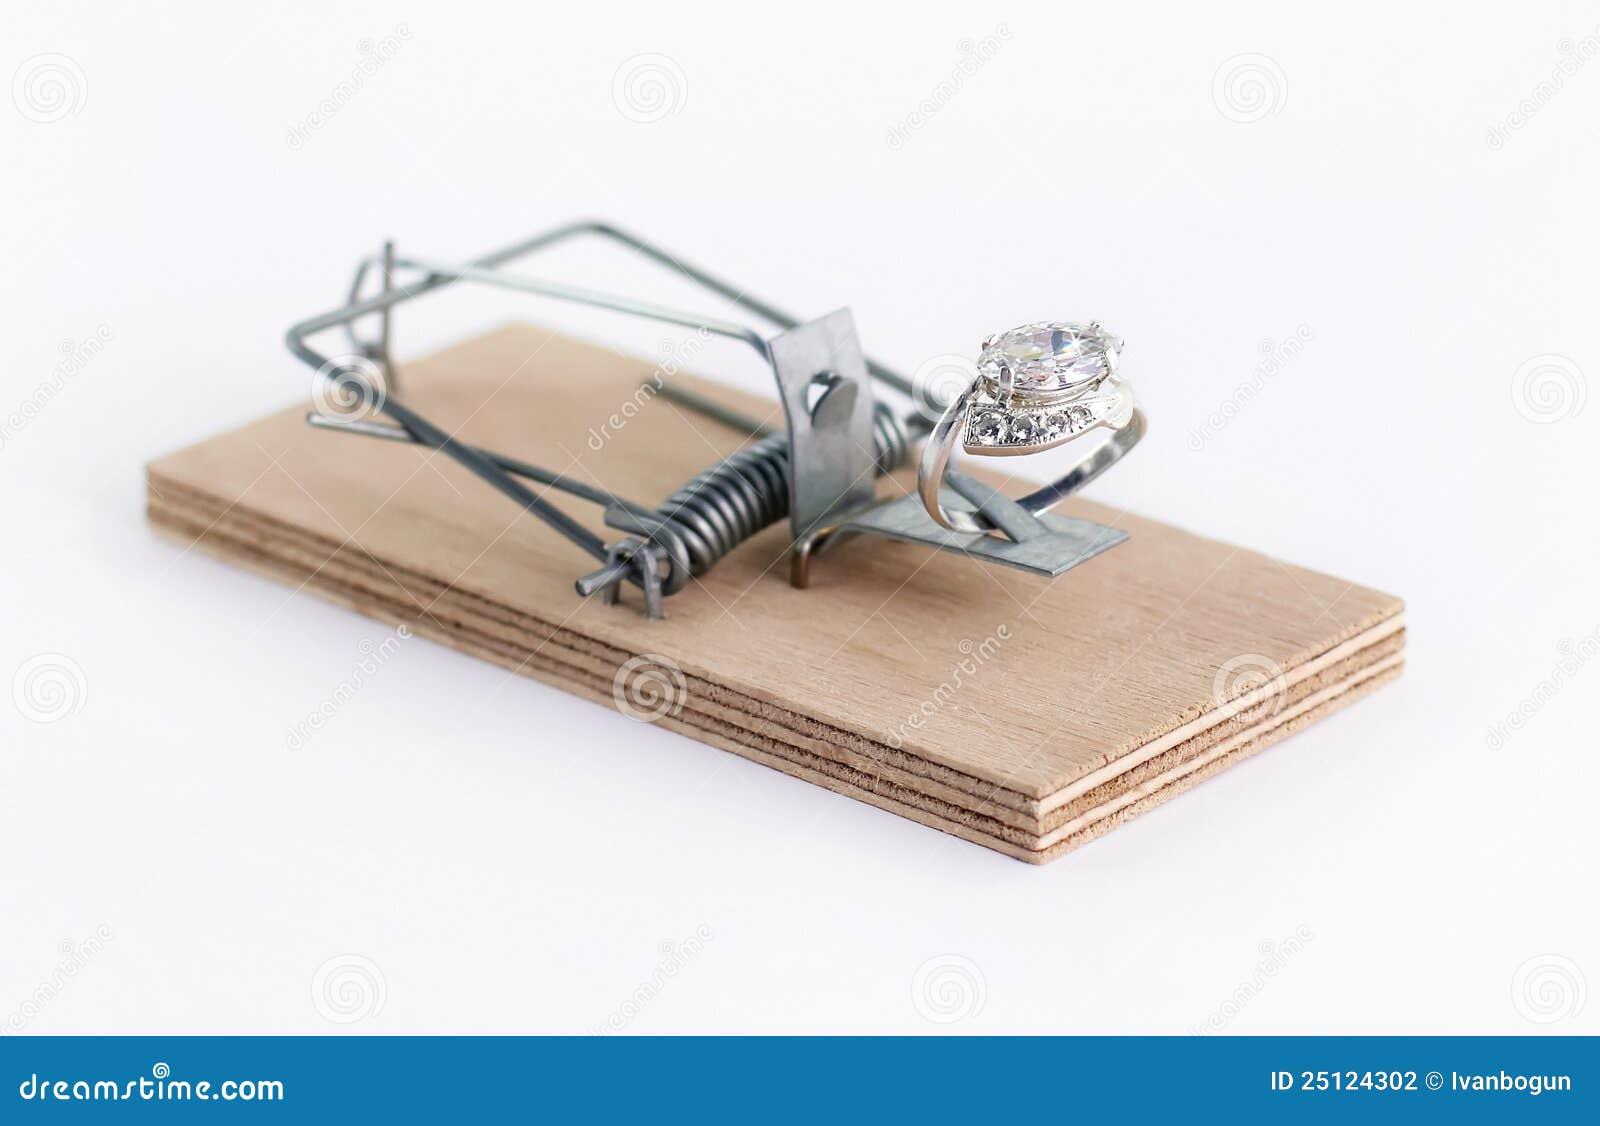 Diamond Wedding Gift Ideas: Diamond Ring Wedding Gift On Mouse Trap Stock Photography